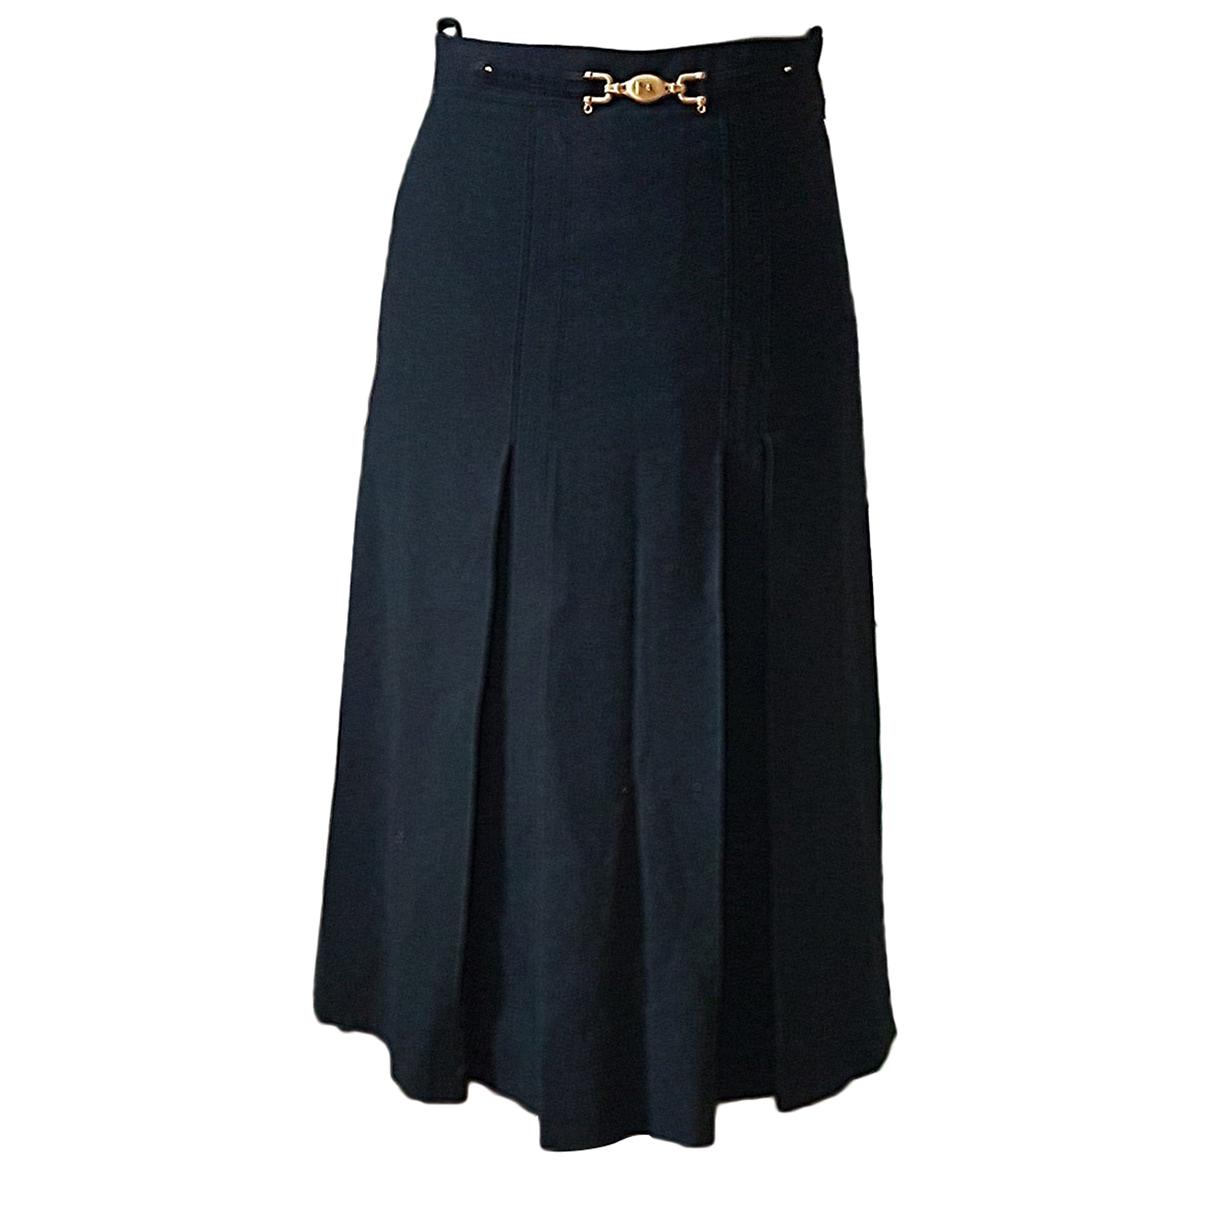 Autre Marque N Black Wool skirt for Women 36 FR